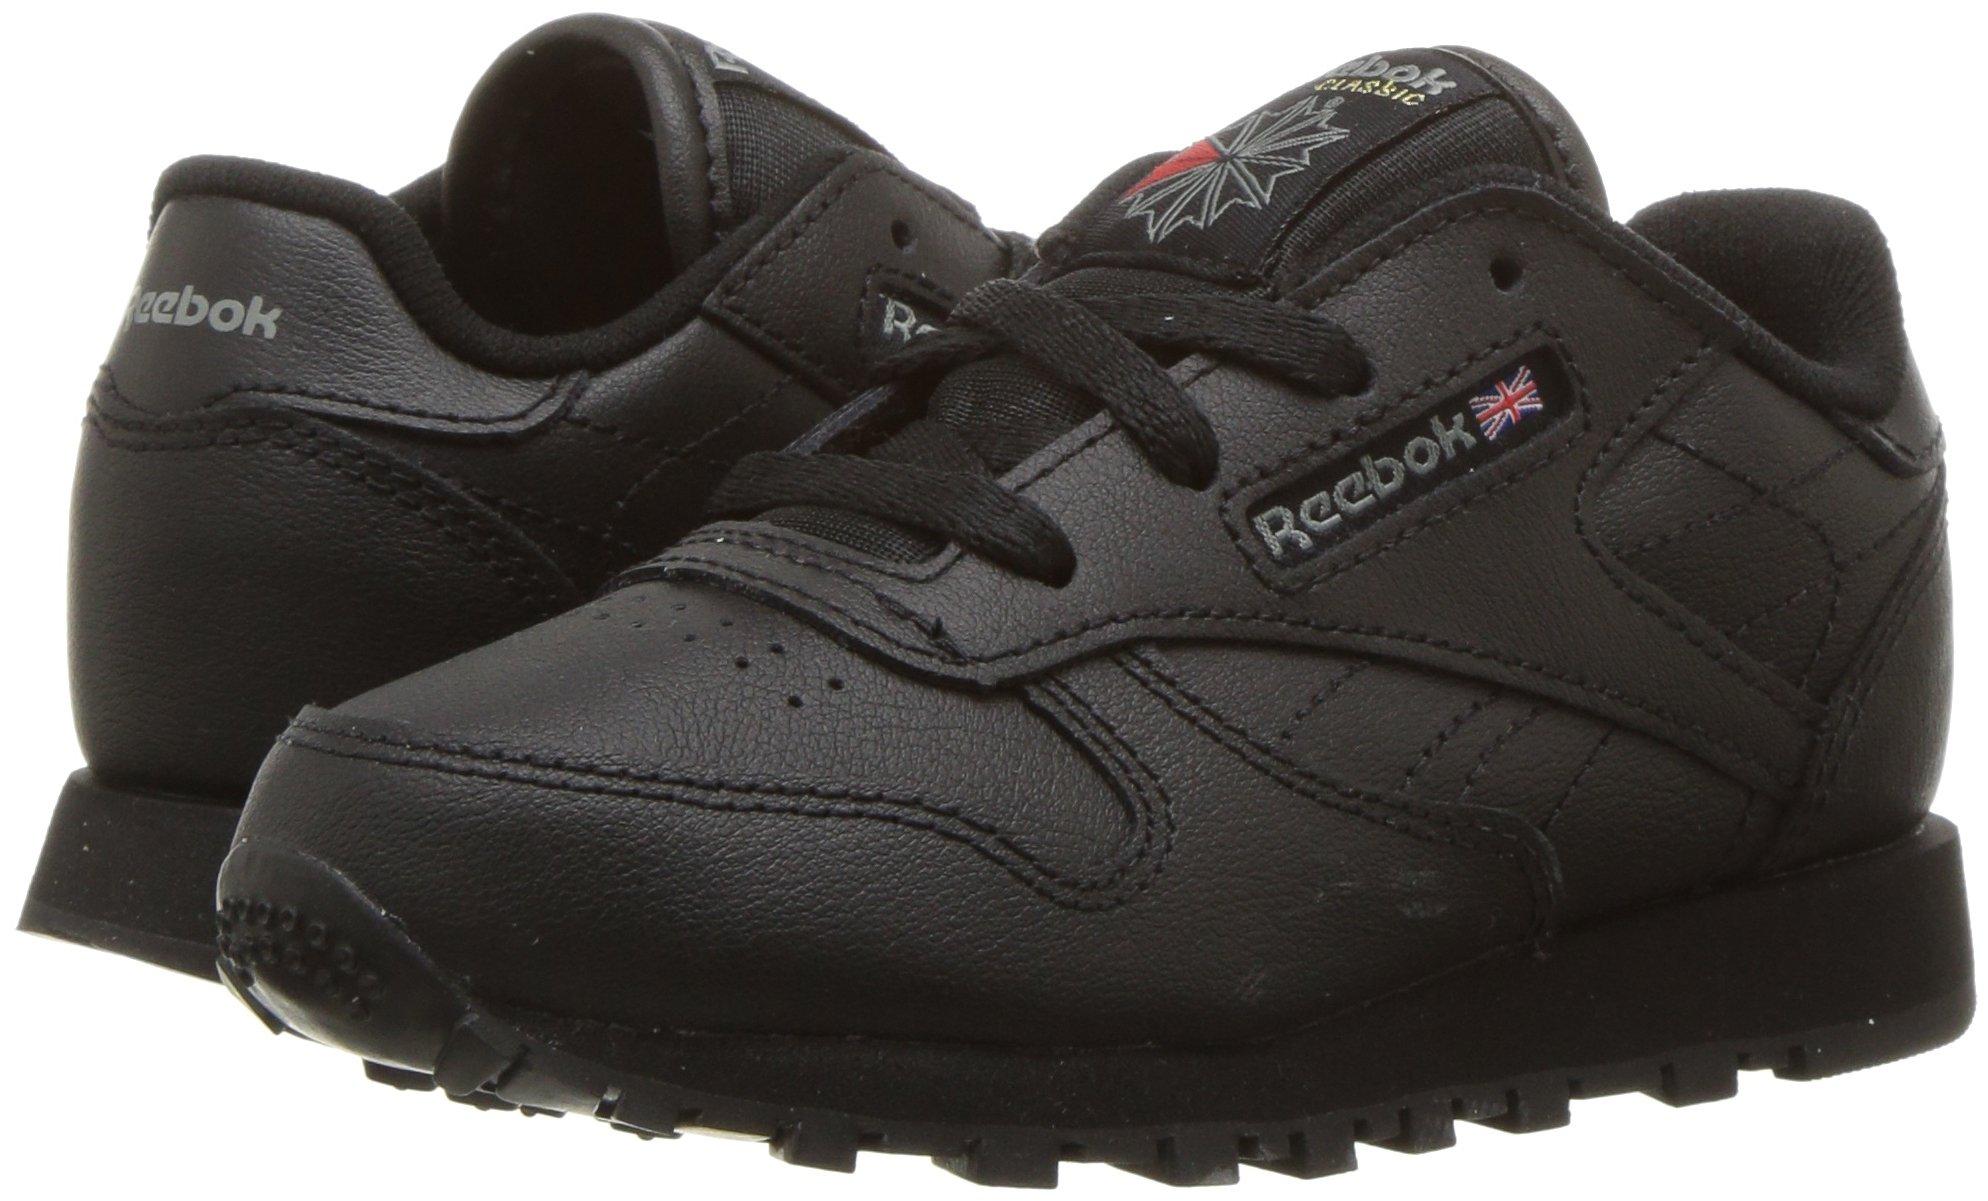 ec235e7825e Reebok - Reebok 92757  Infant Toddler Classic Leather Black Sneaker (8 M US  Toddler) - Walmart.com